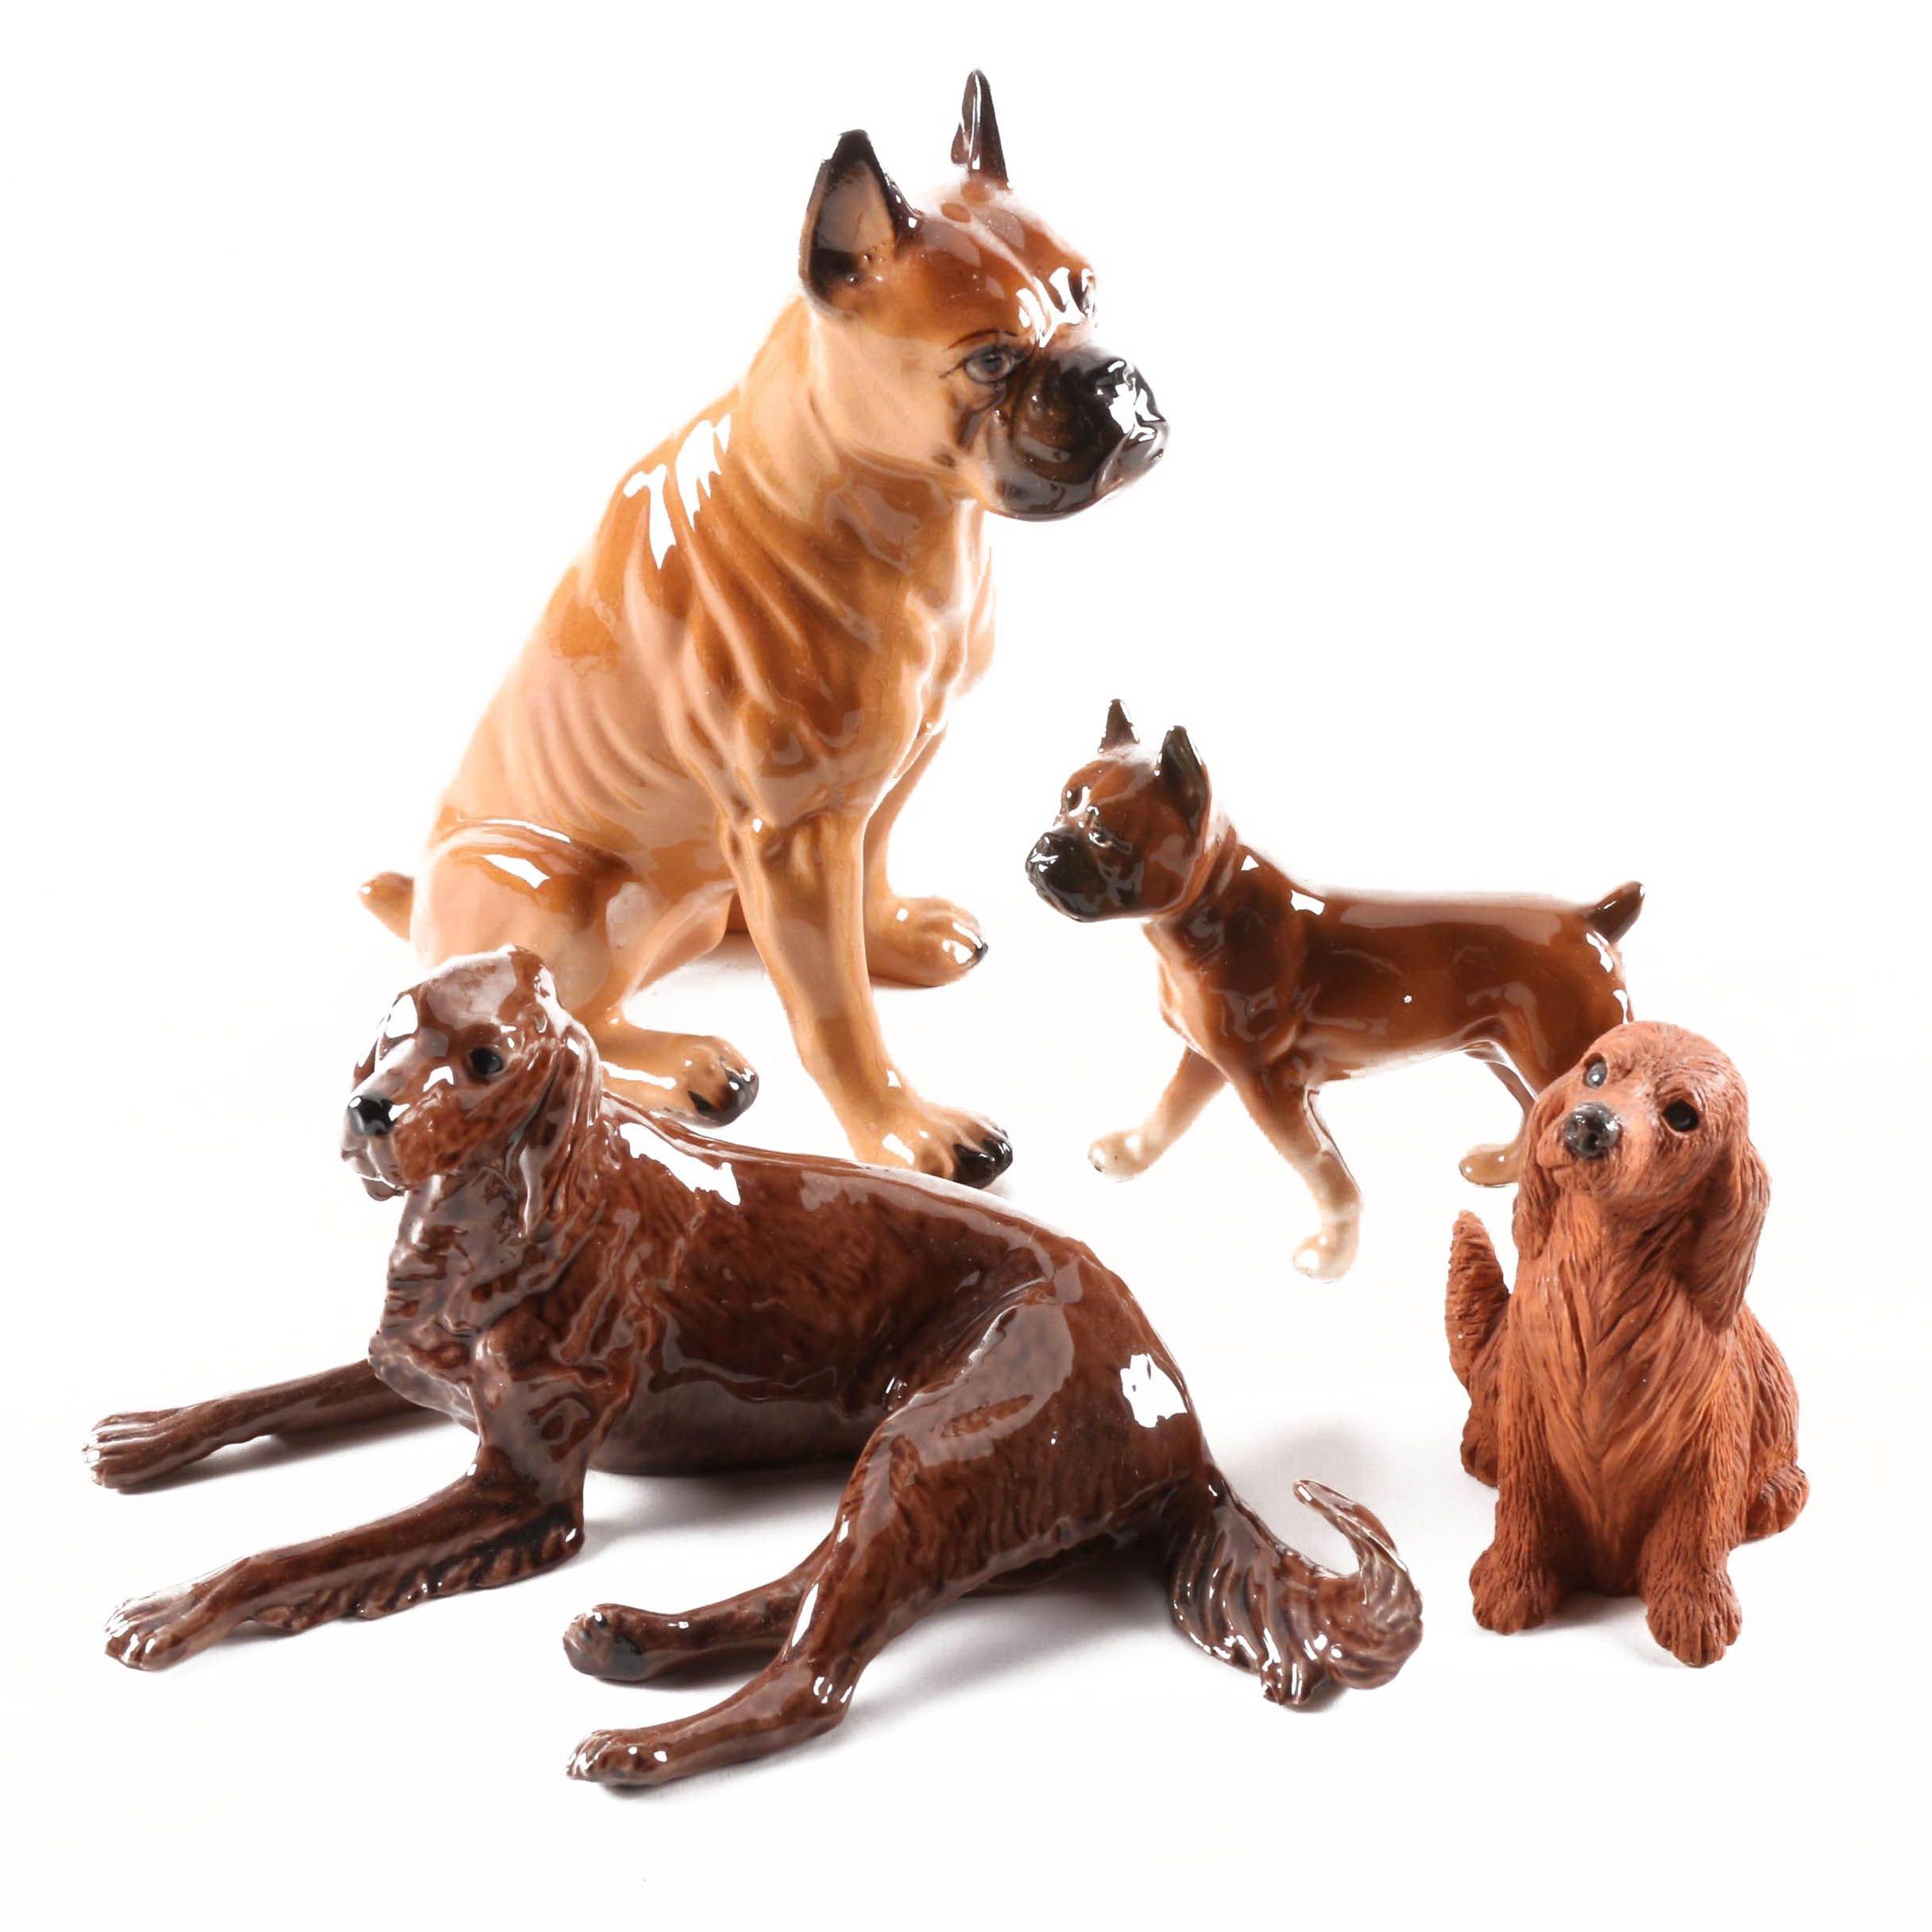 Ceramic and Resin Dog Figurines